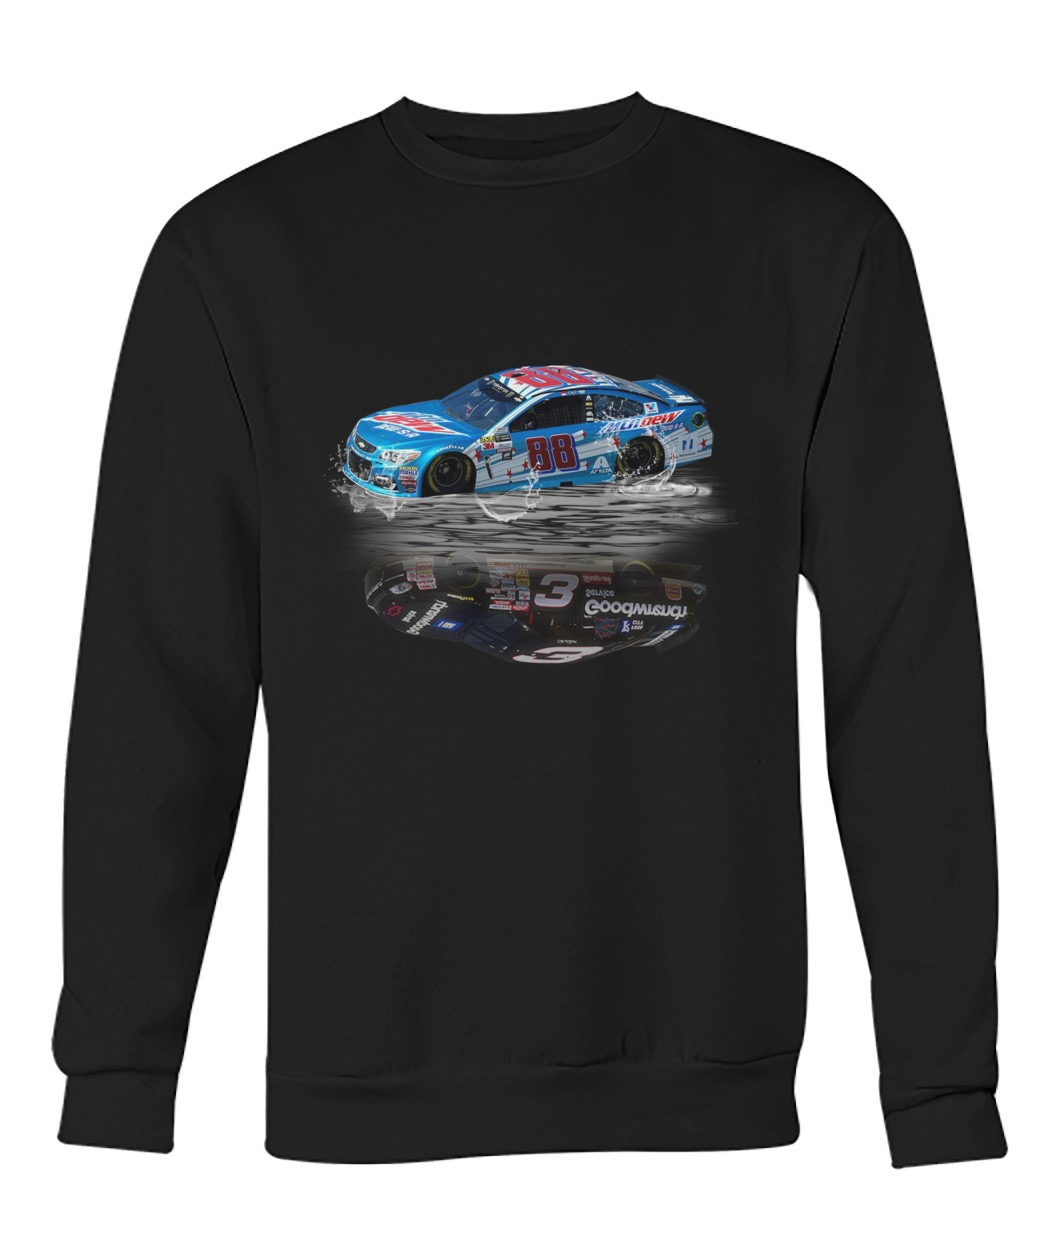 Dale Earnhardt Jr. 88 Reflection Sr 3 Nascar Sweat shirt